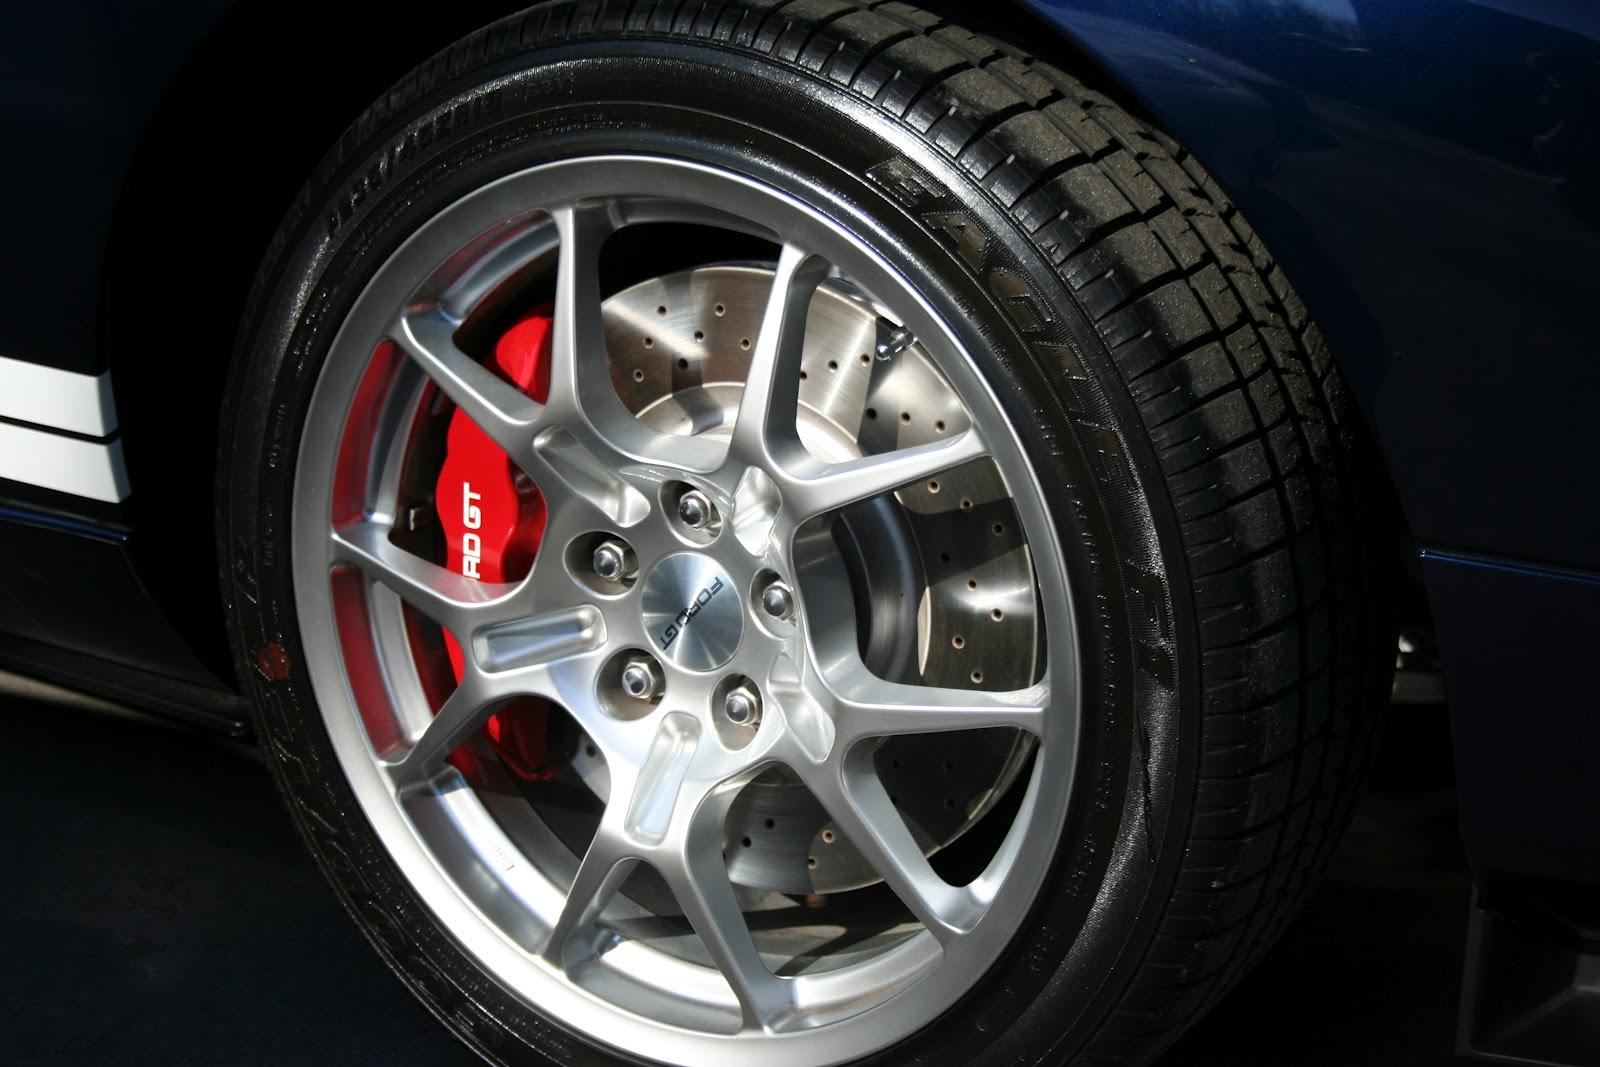 Ford Gt Brakes Wheels Tires Rims